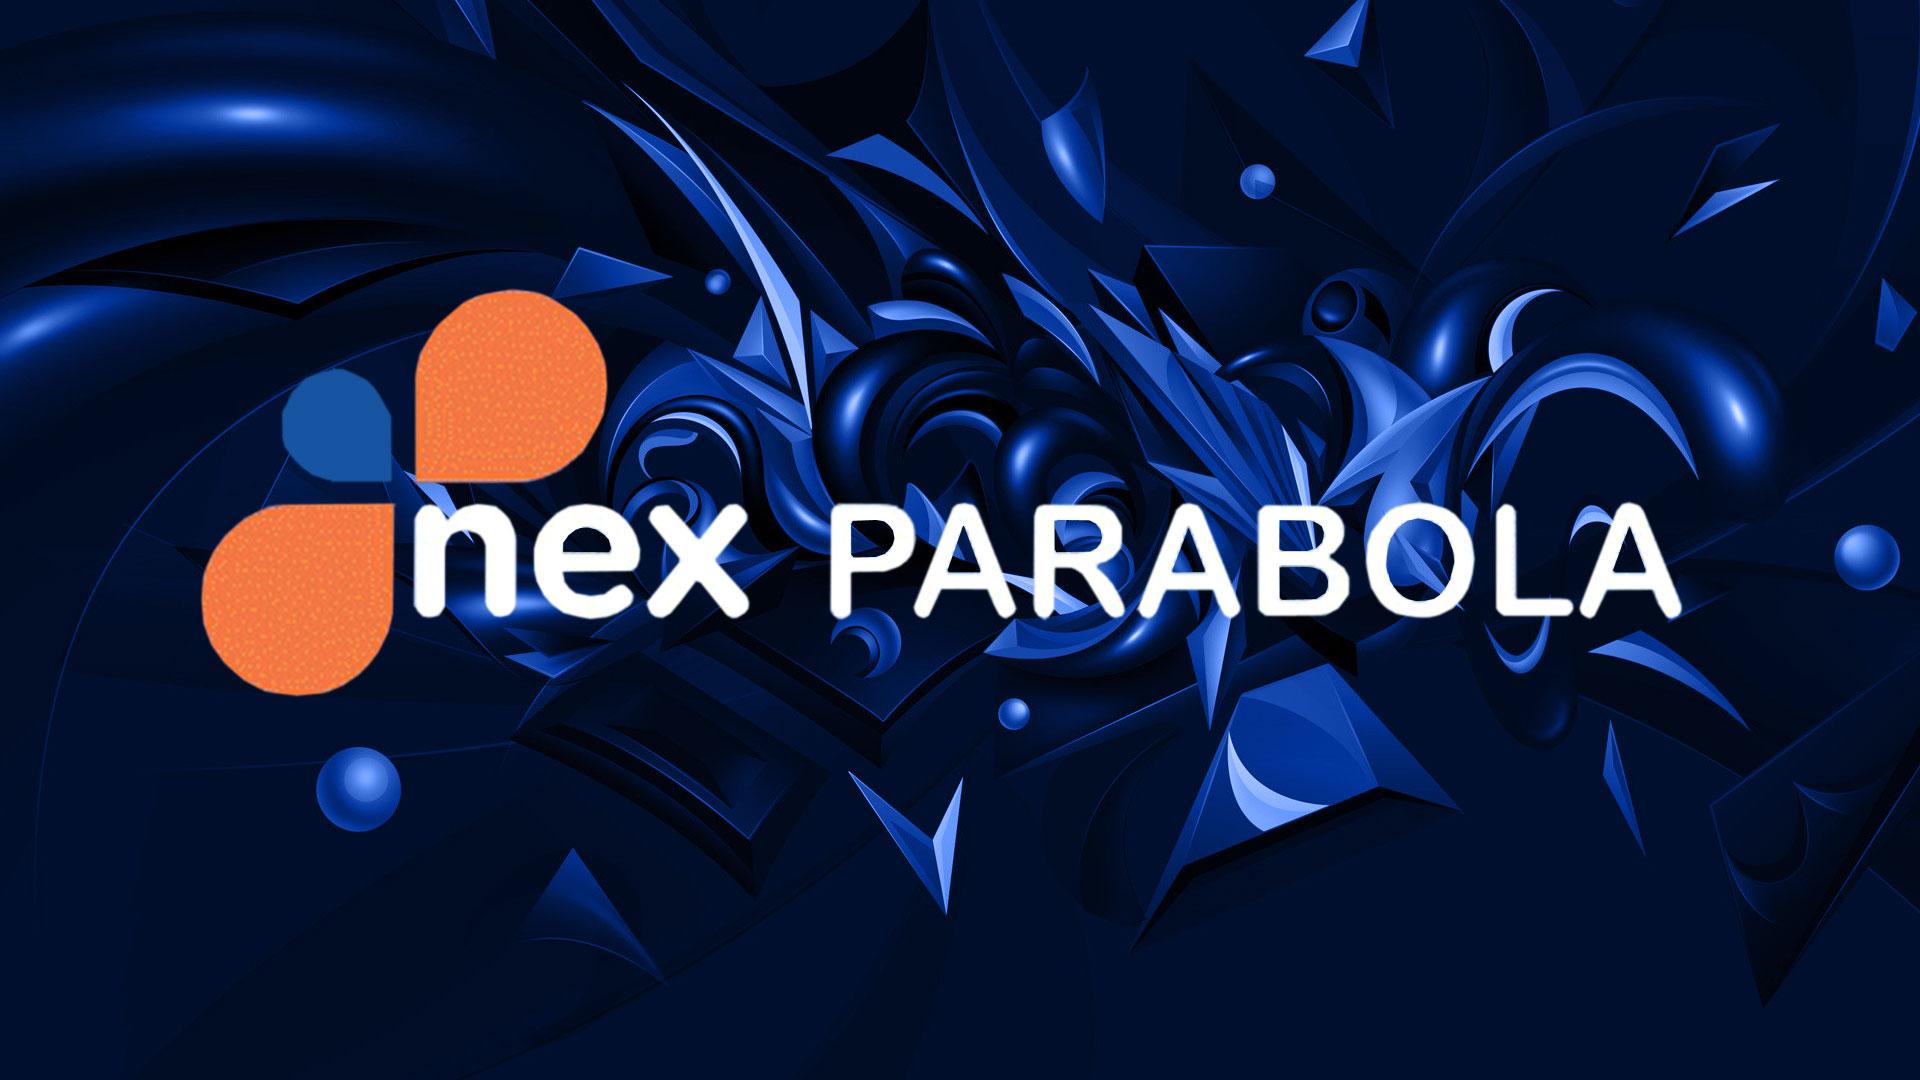 Daftar Frekuensi Channel Nex Parabola Terbaru Palapa D